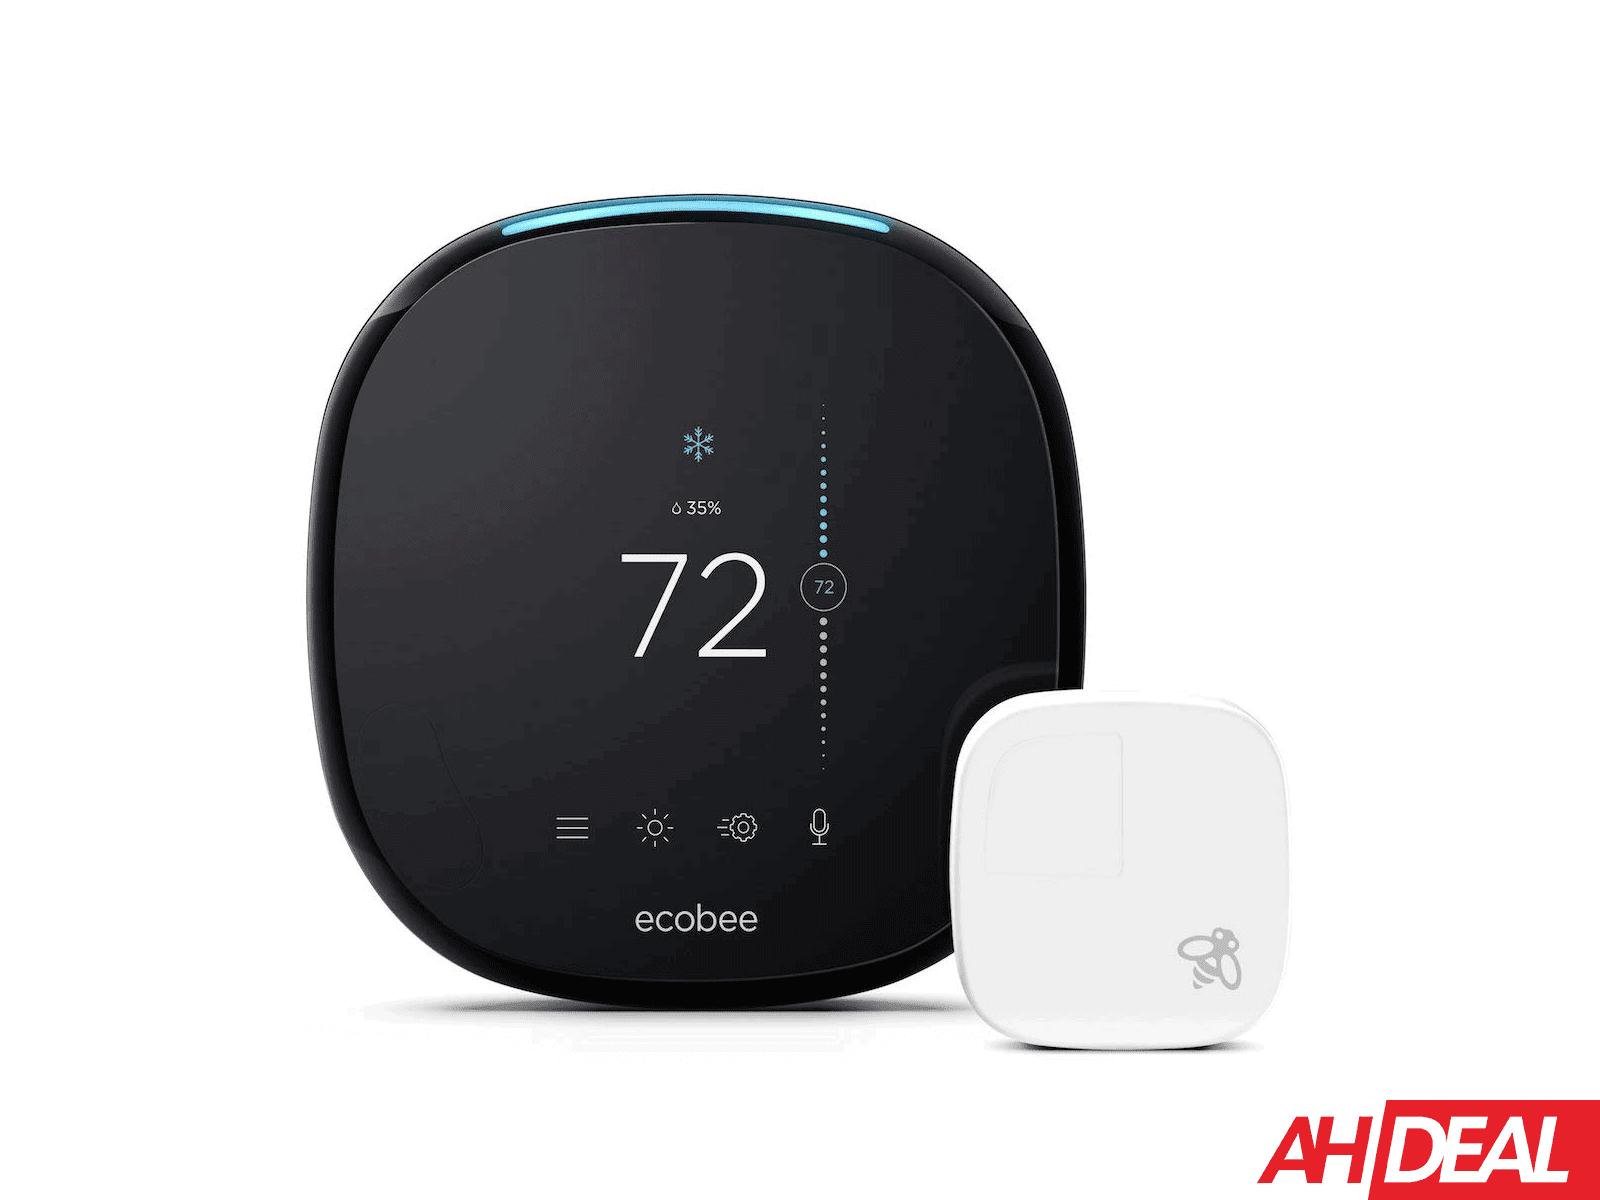 Deal  Ecobee4 Smart Thermostat With Amazon Alexa Built